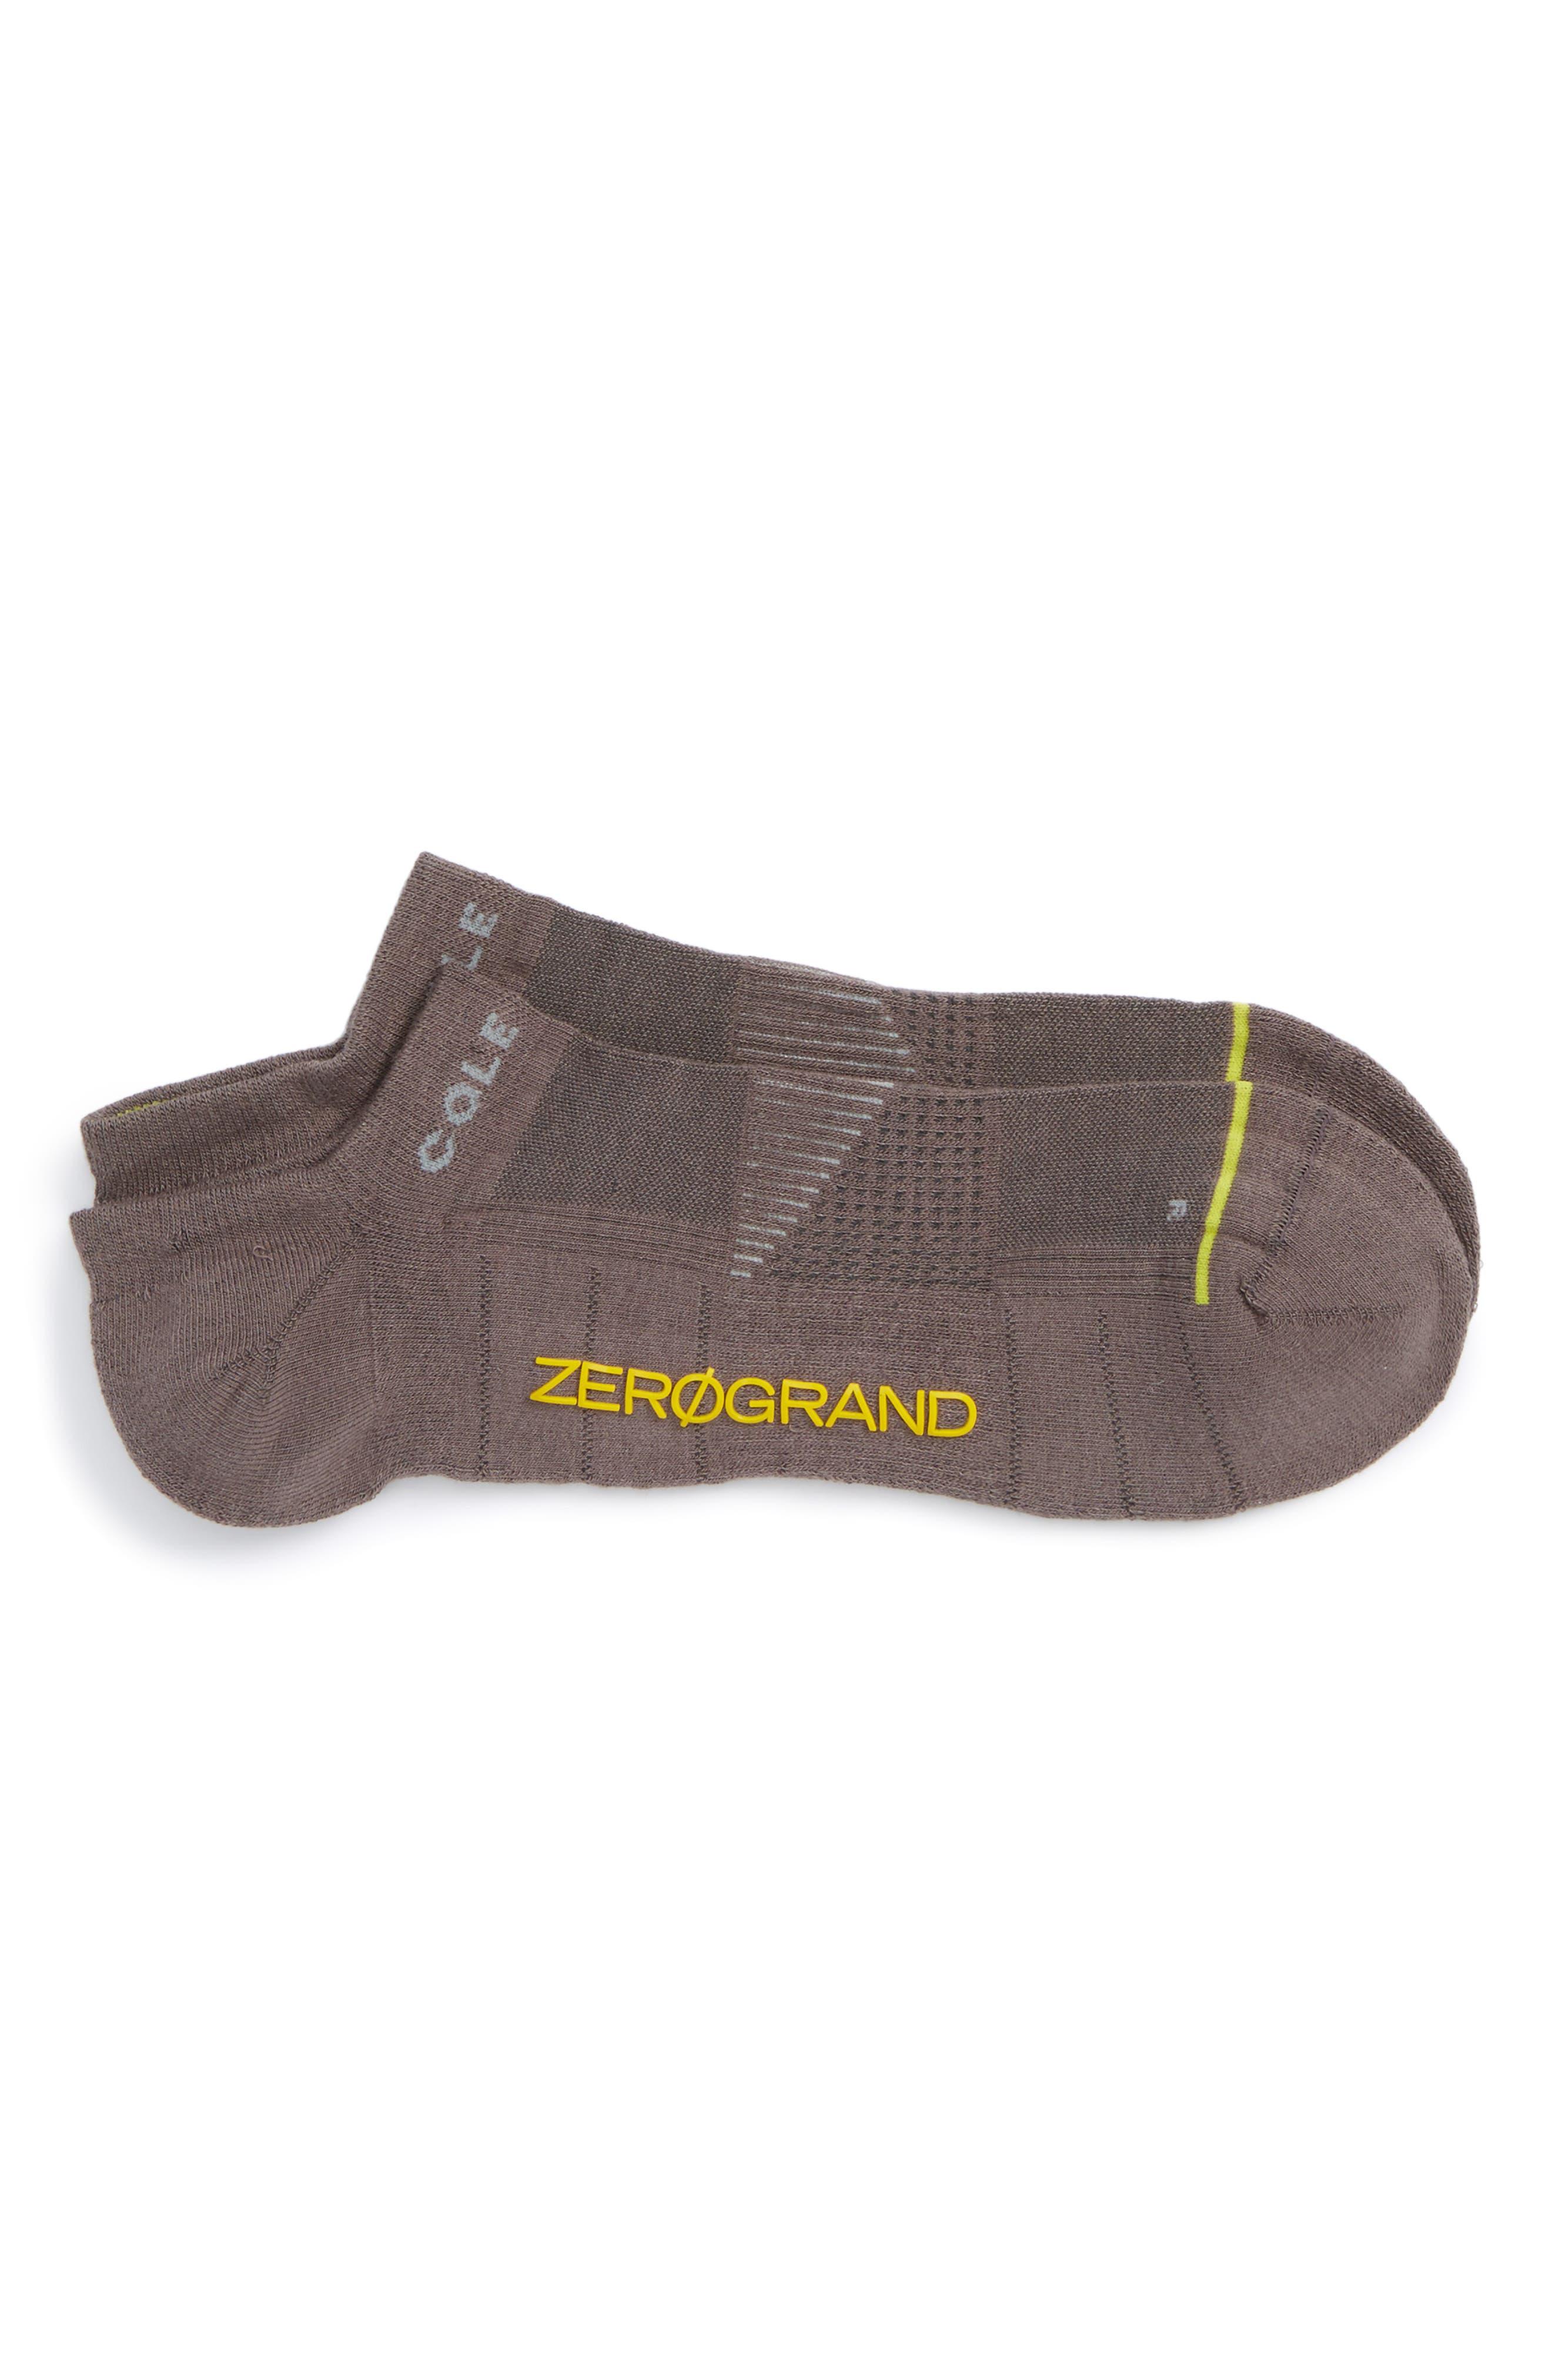 ZeroGrand Liner Socks,                             Main thumbnail 1, color,                             031